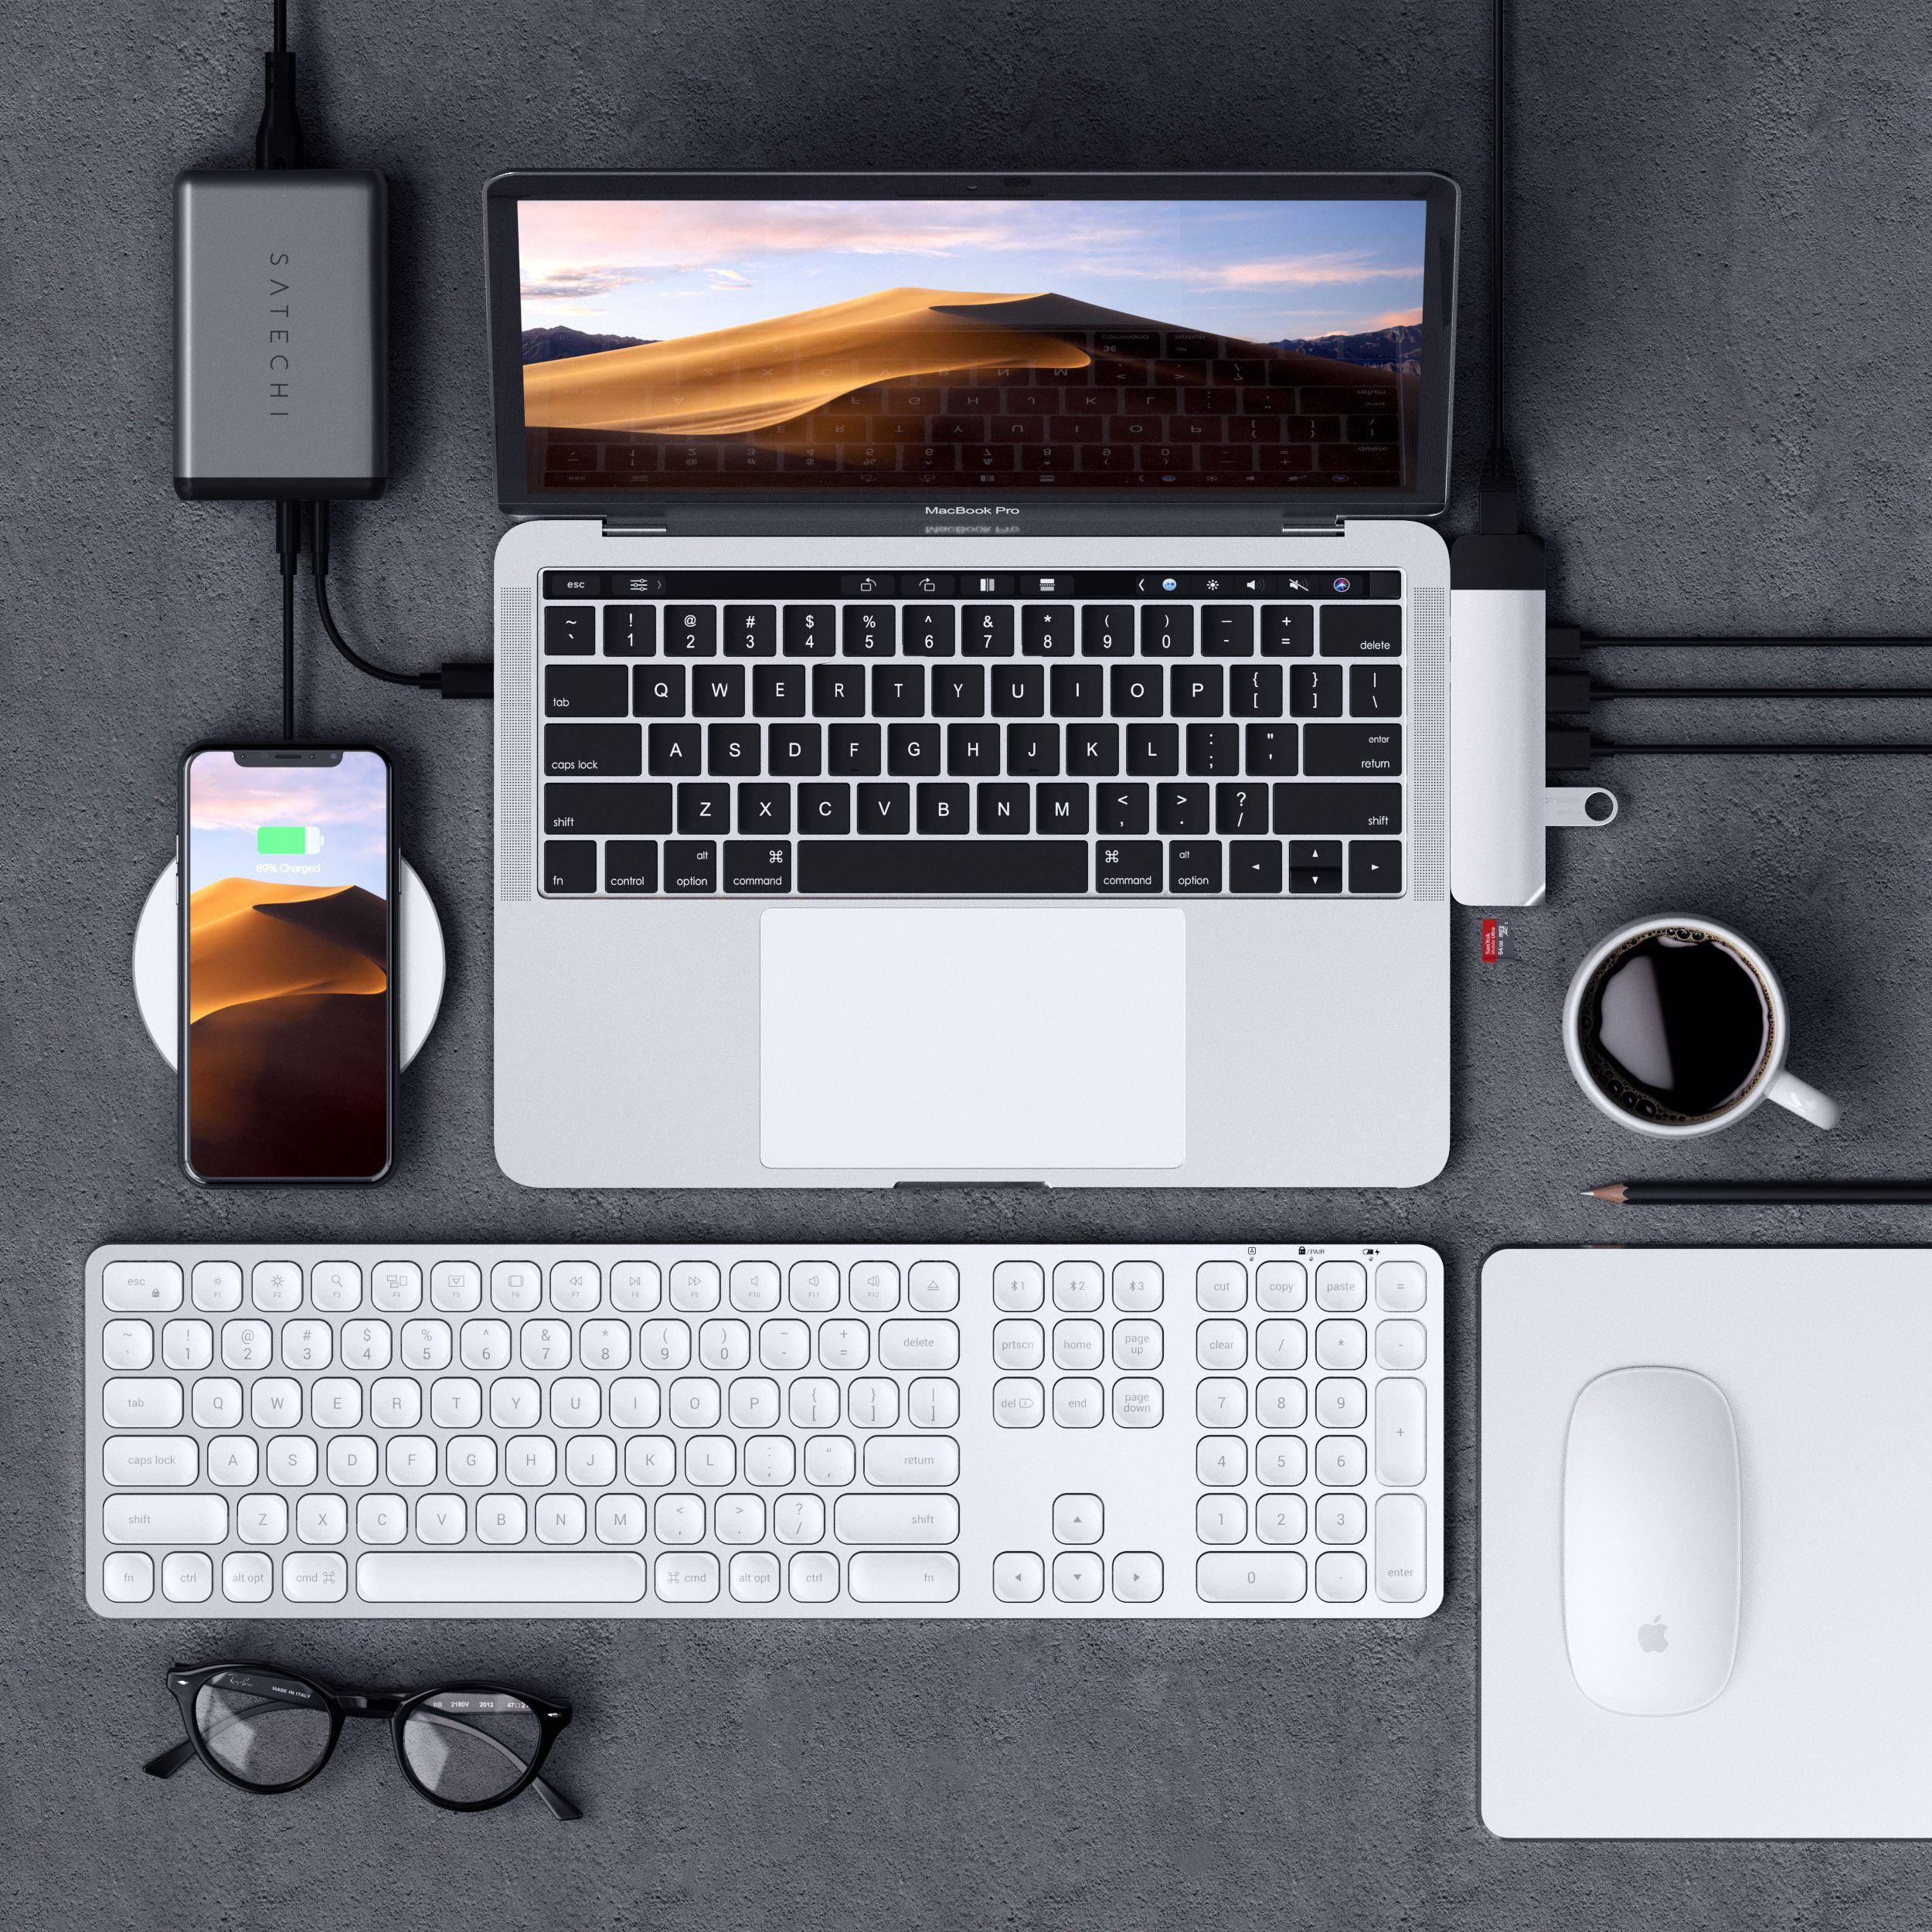 Aluminum Bluetooth Keyboard Keyboard, Desktop setup, Macbook